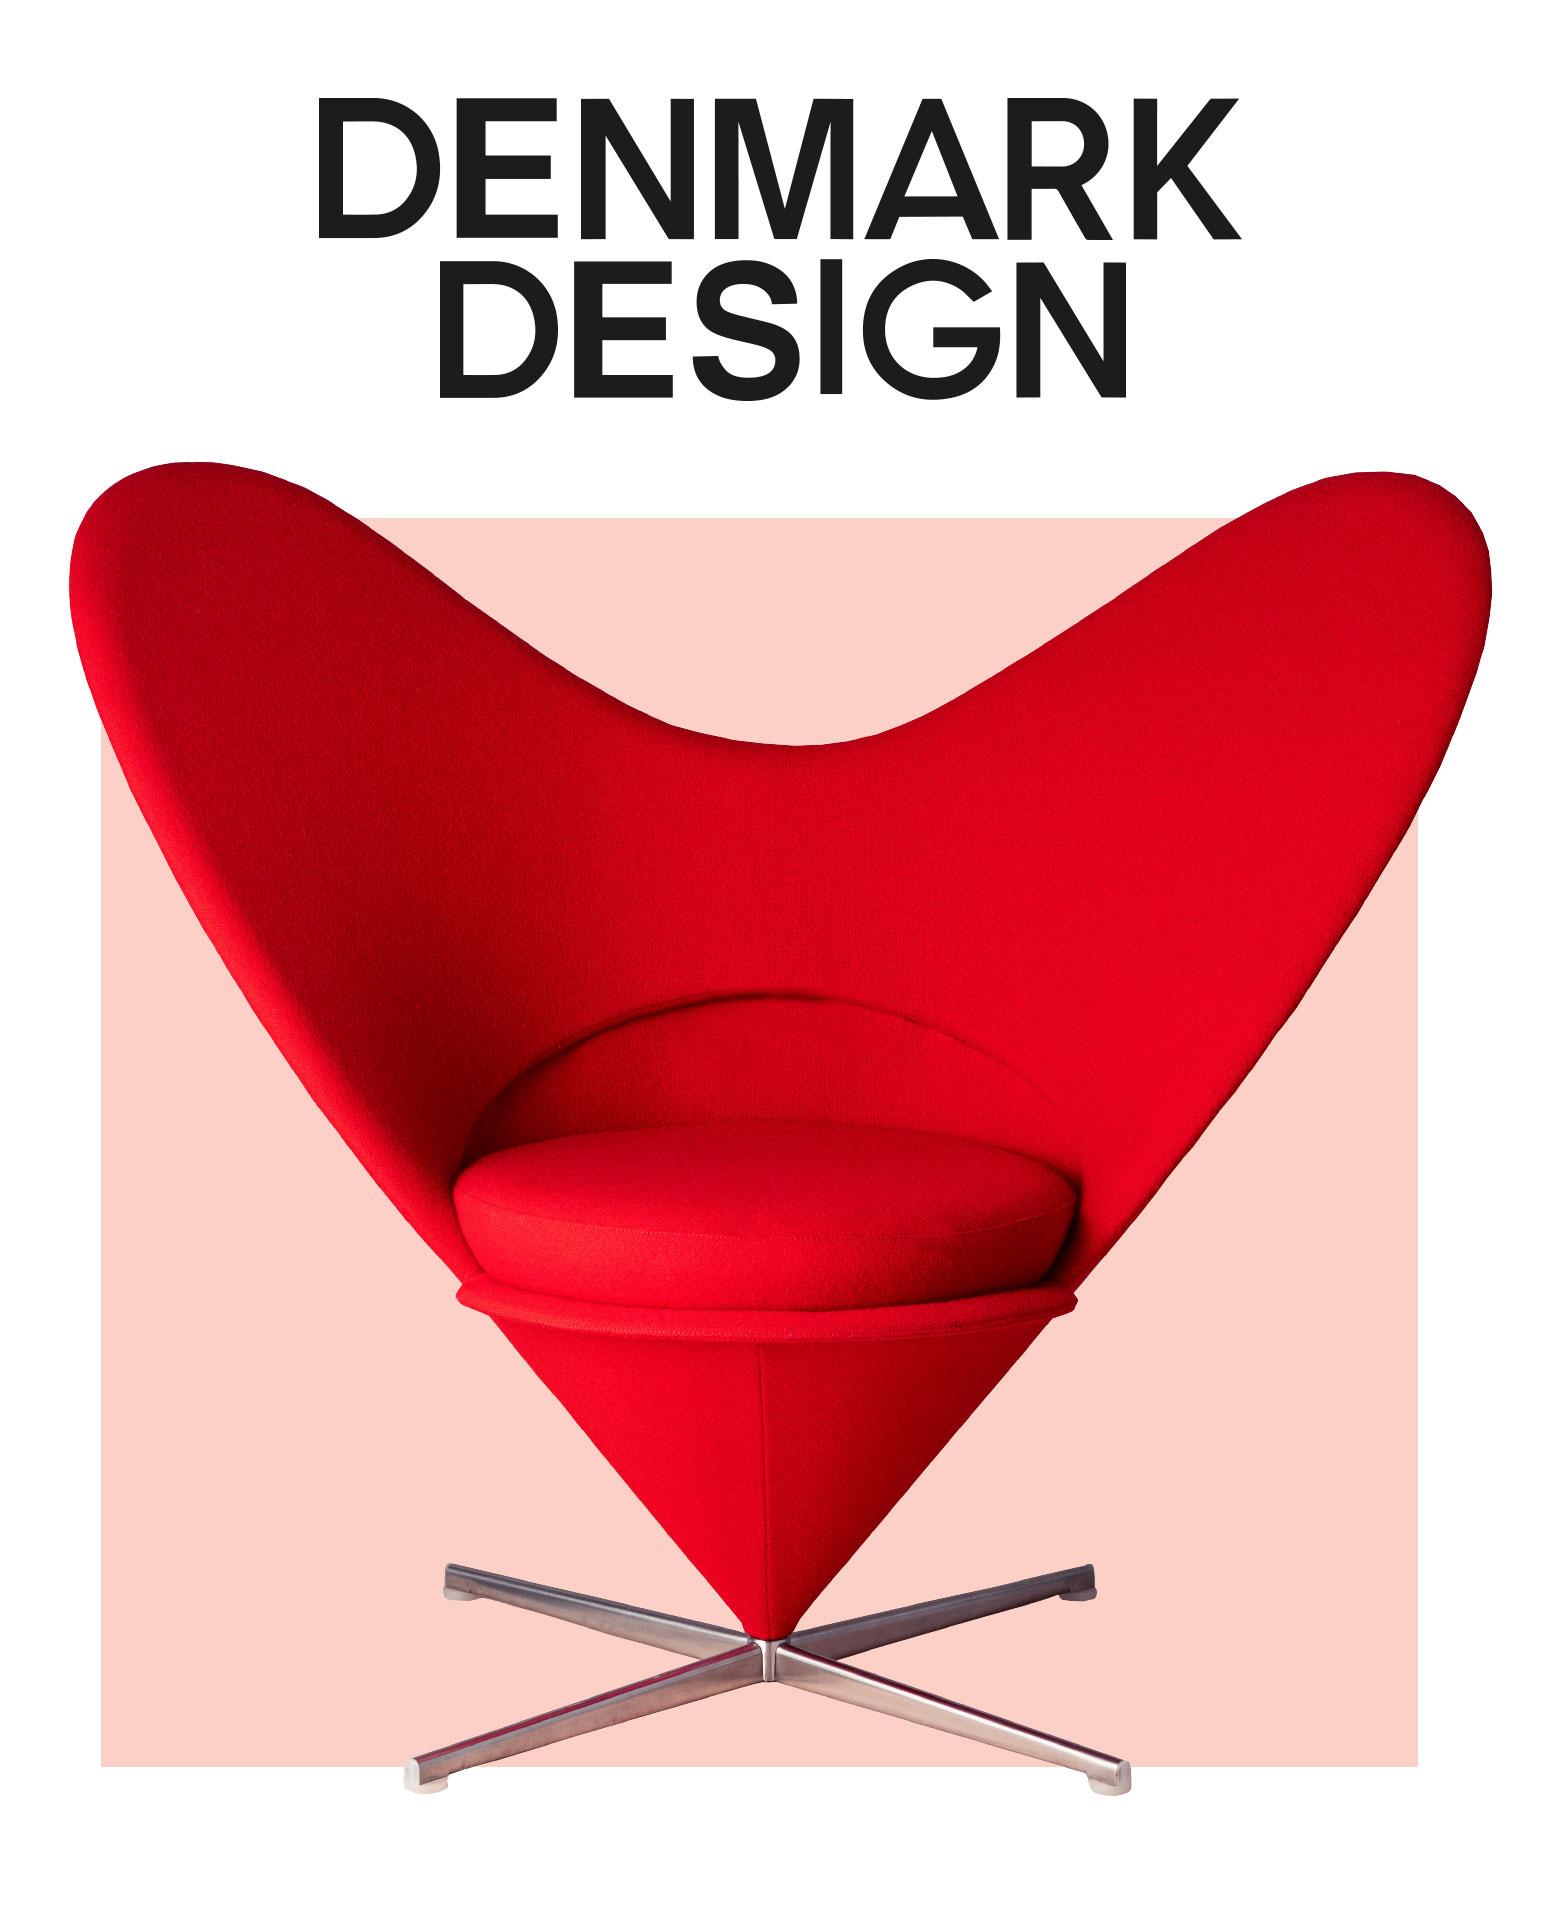 Denmark Design at Auckland Art Gallery